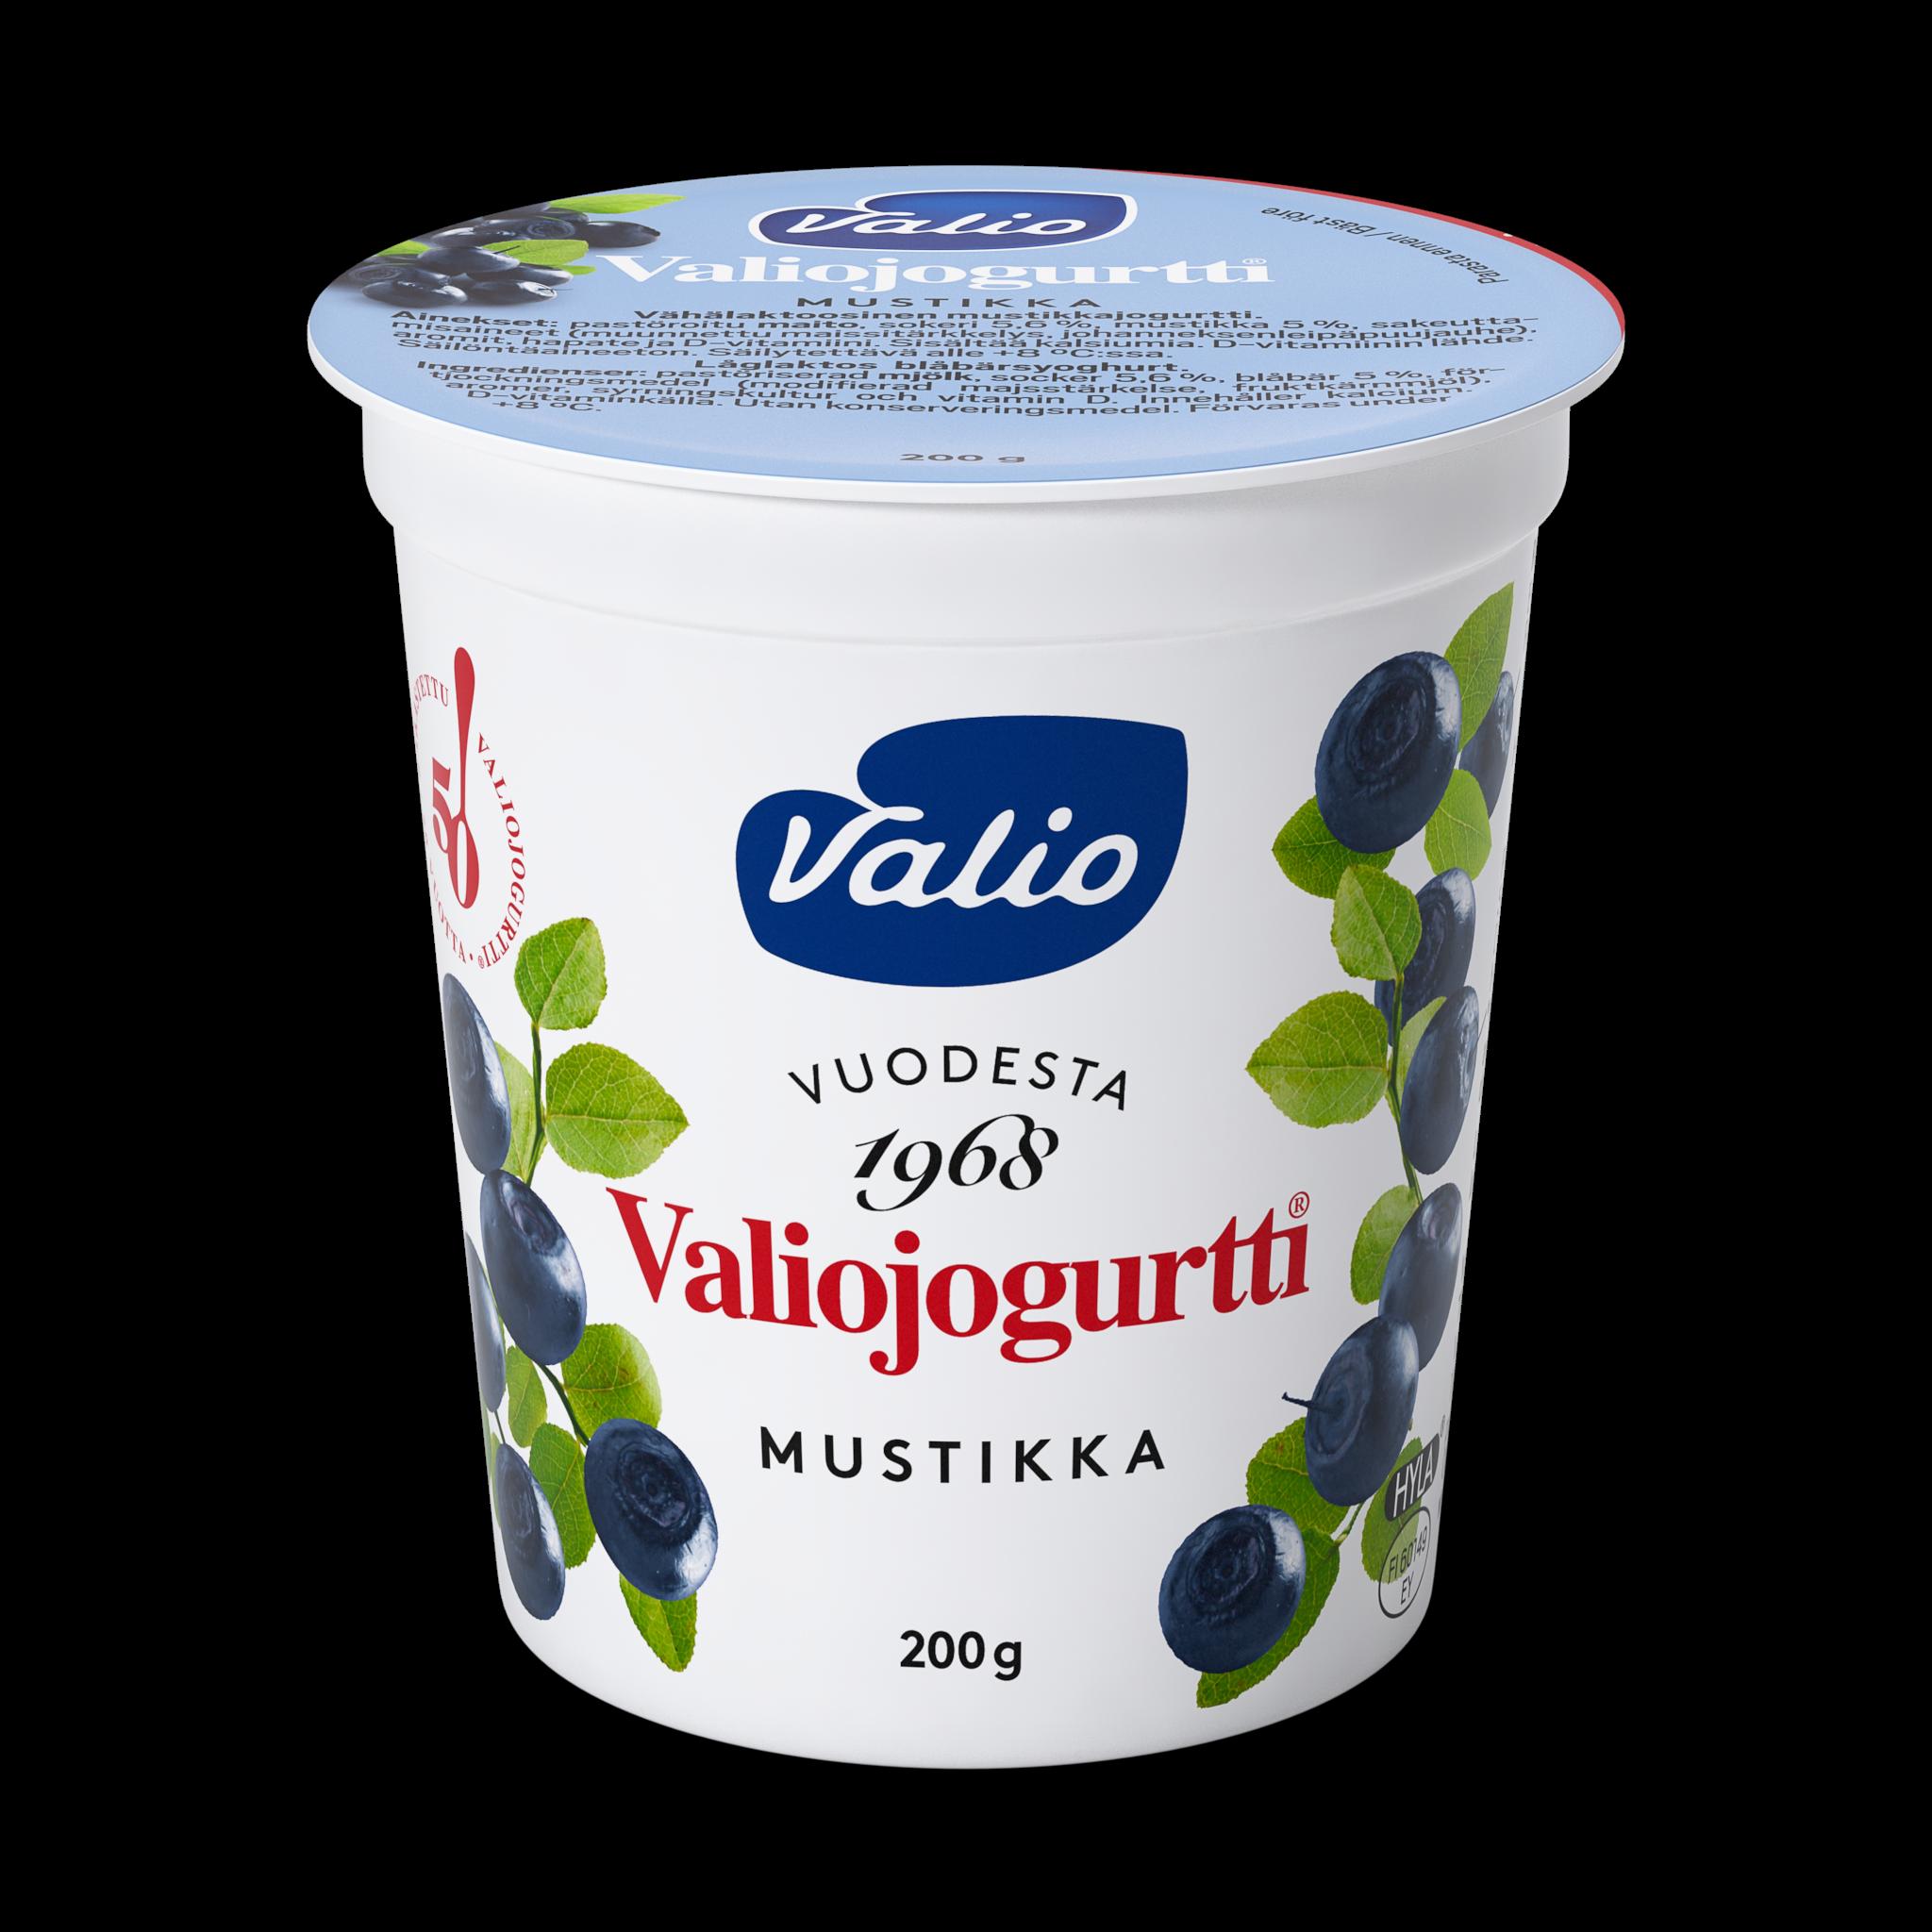 Valiojogurtti® mustikka HYLA®